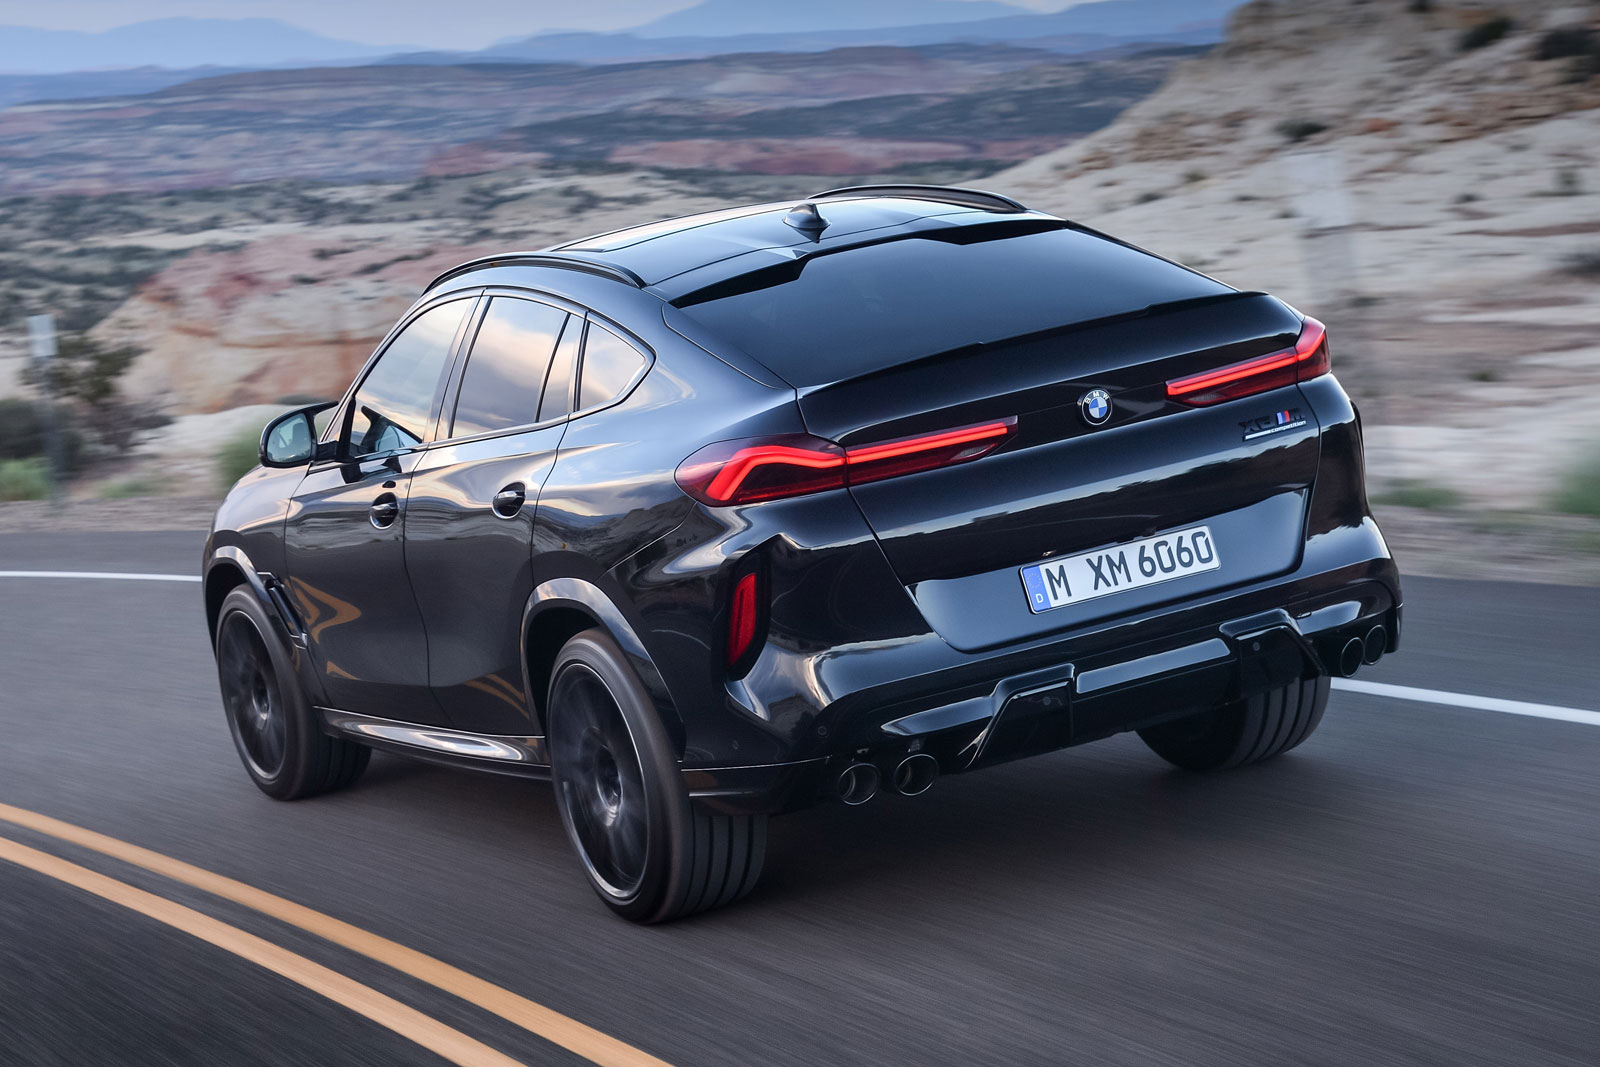 Bmw X6m Competition Car Body Design